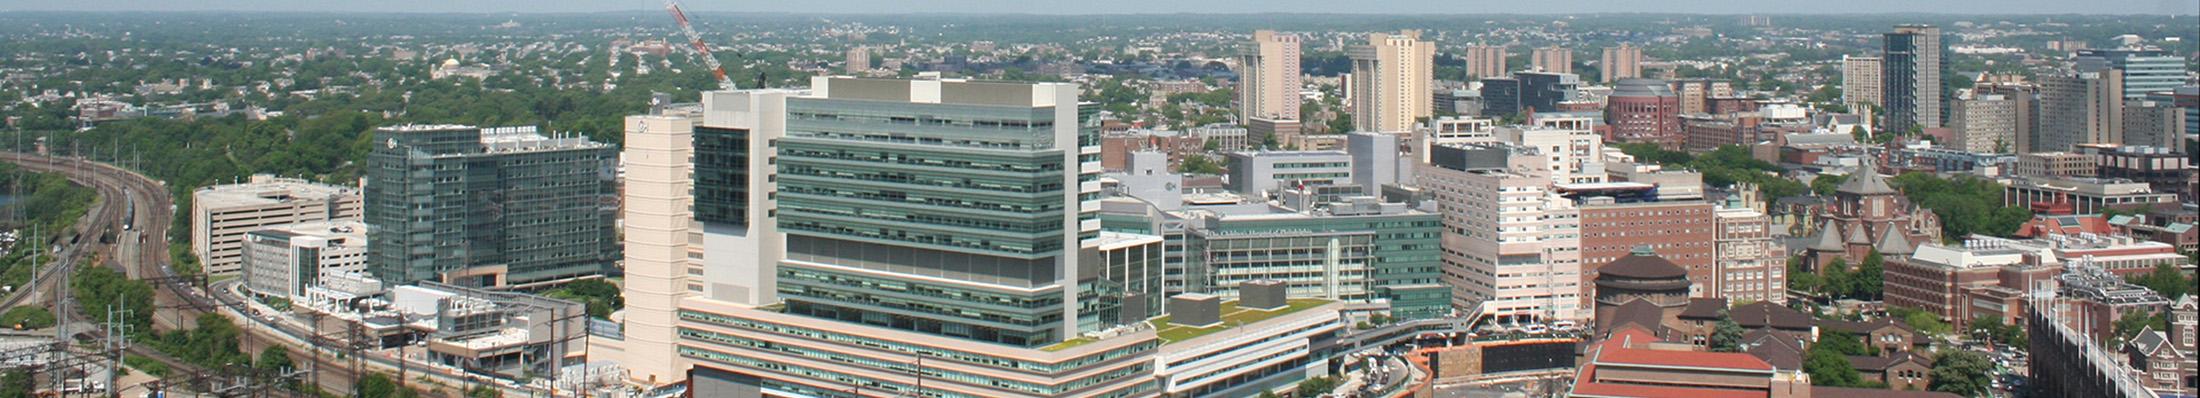 Aerial Photo of Penn Medicine